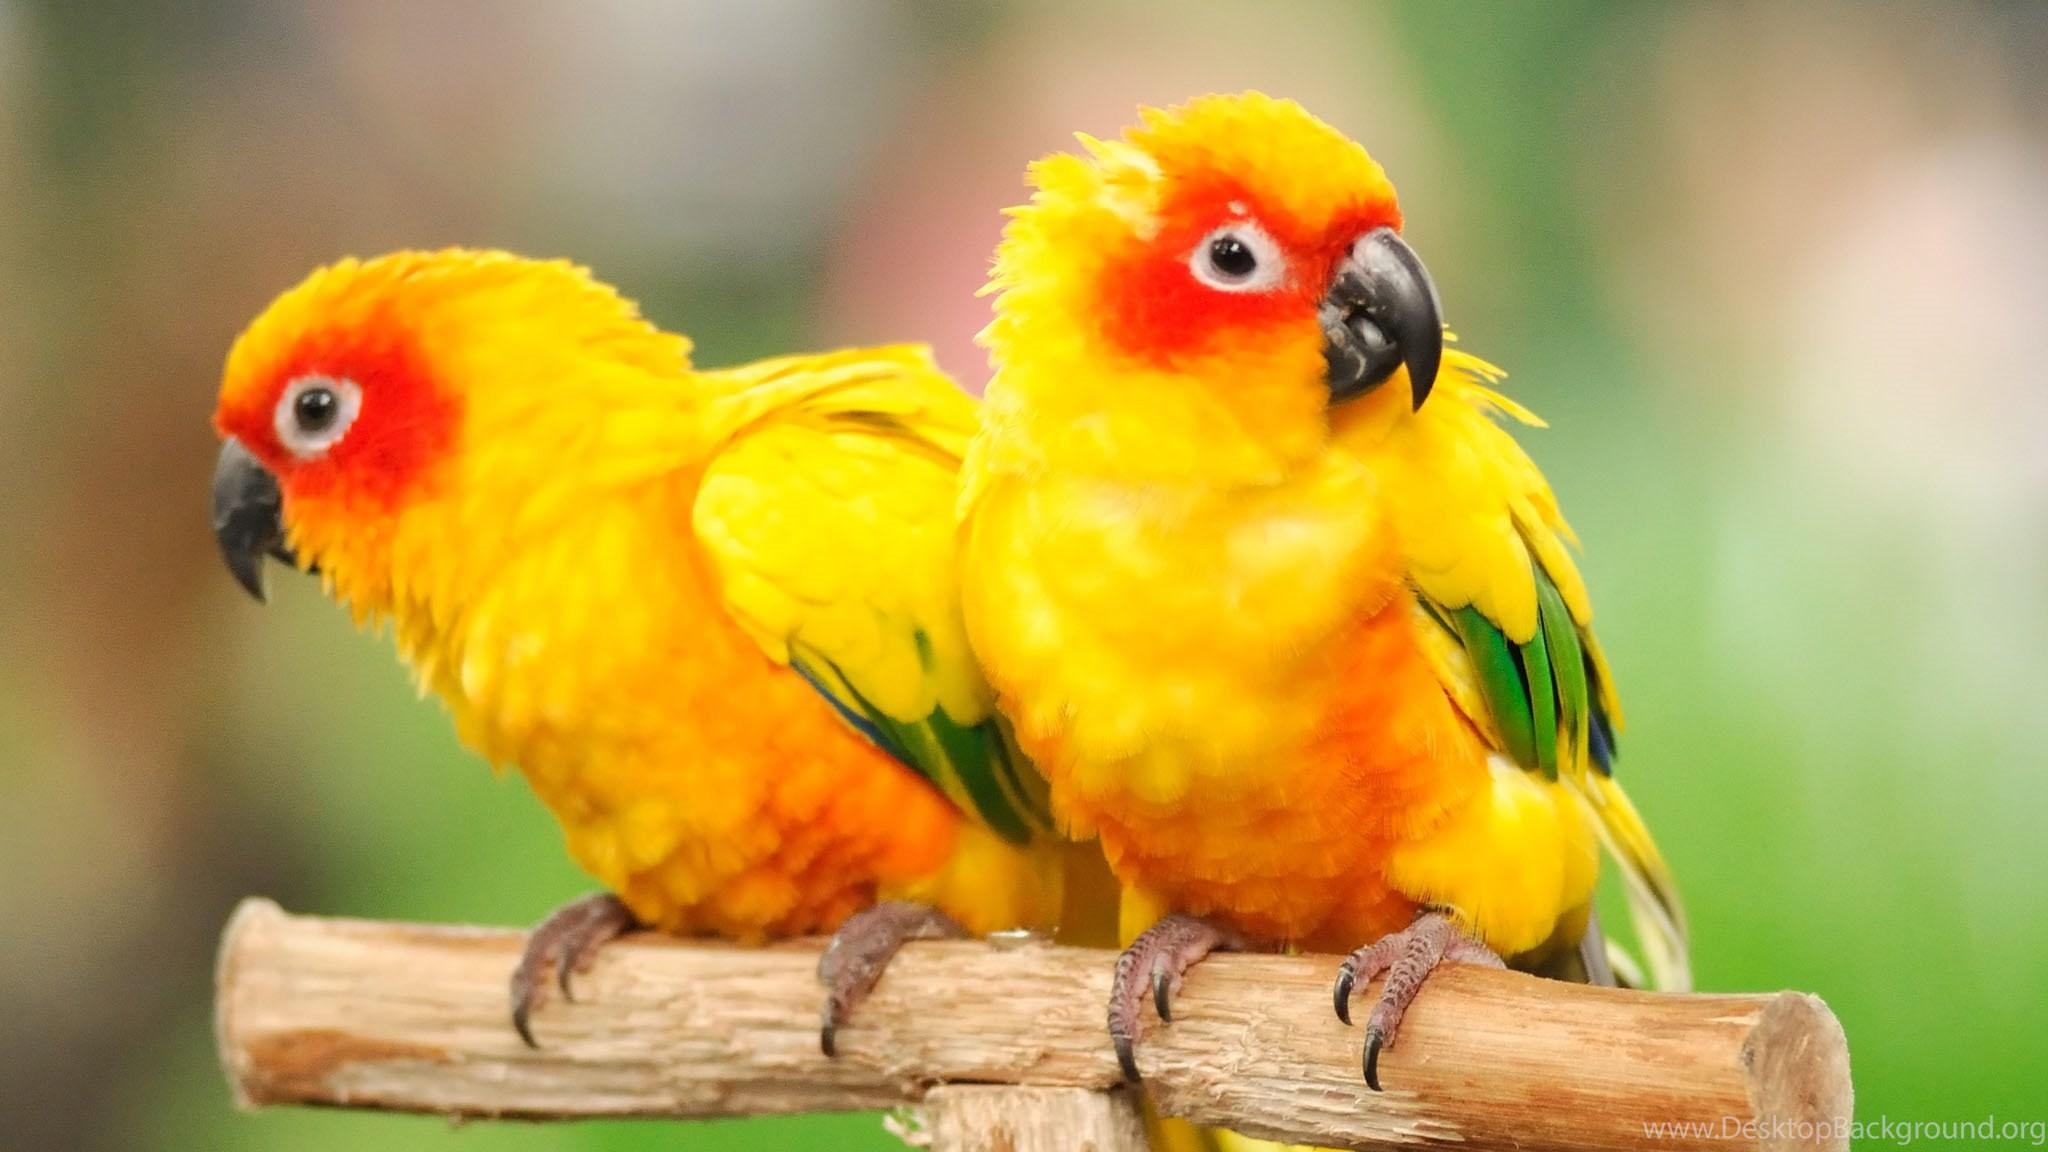 Cute parrots wallpapers